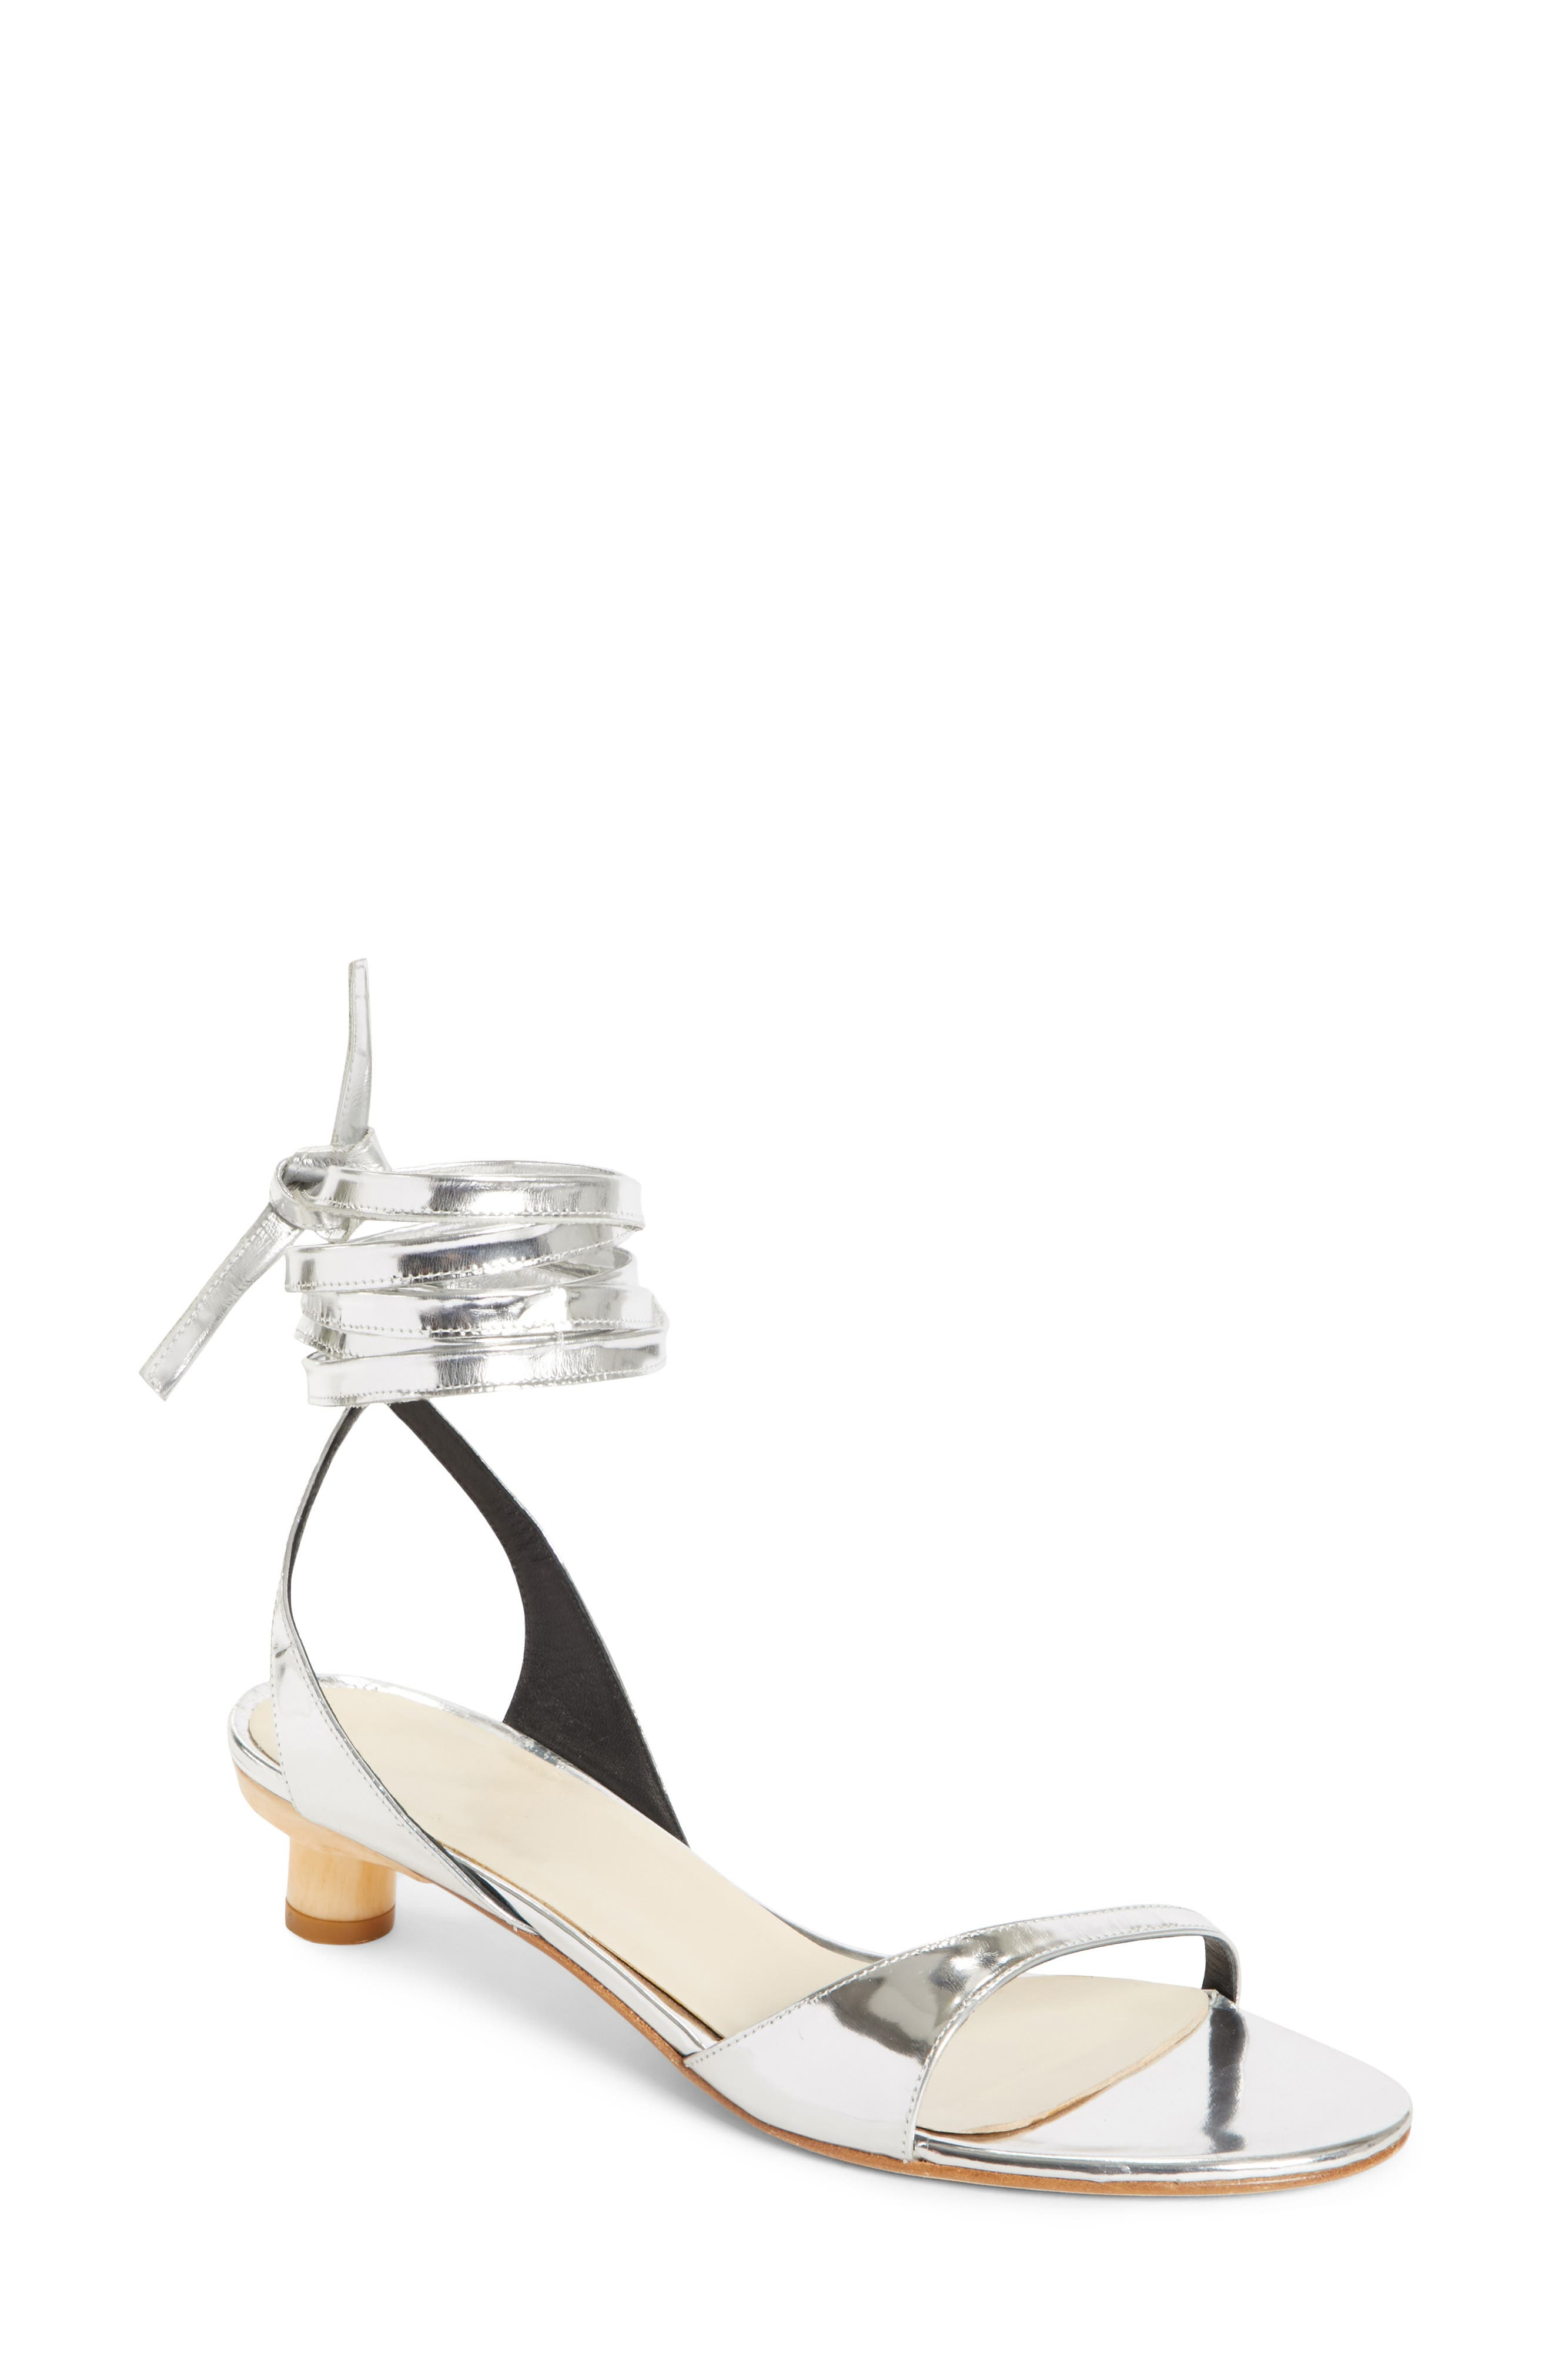 TIBI Scott Ankle Tie Sandal, Main, color, 042